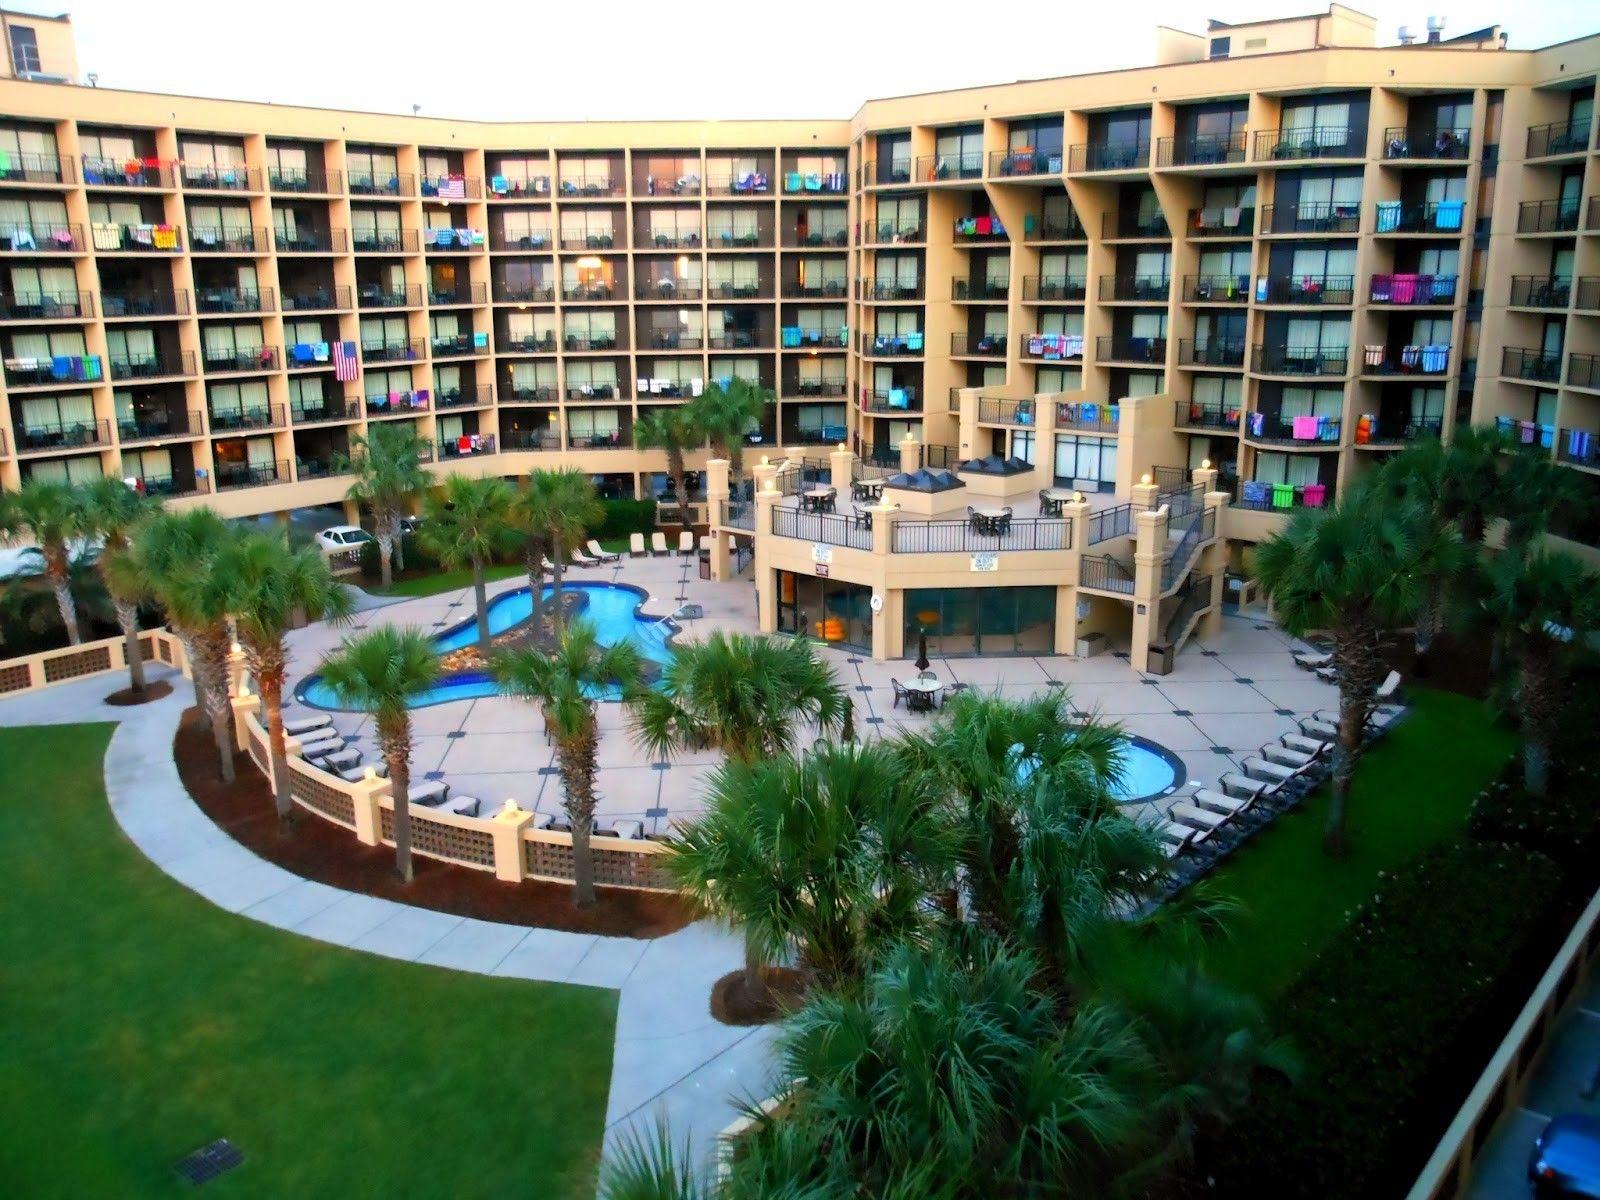 What S New In Myrtle Beach In 2015 Springmaid Beach Resort Becomes Doubletree Myrtle Beach Vacation Myrtle Beach Myrtle